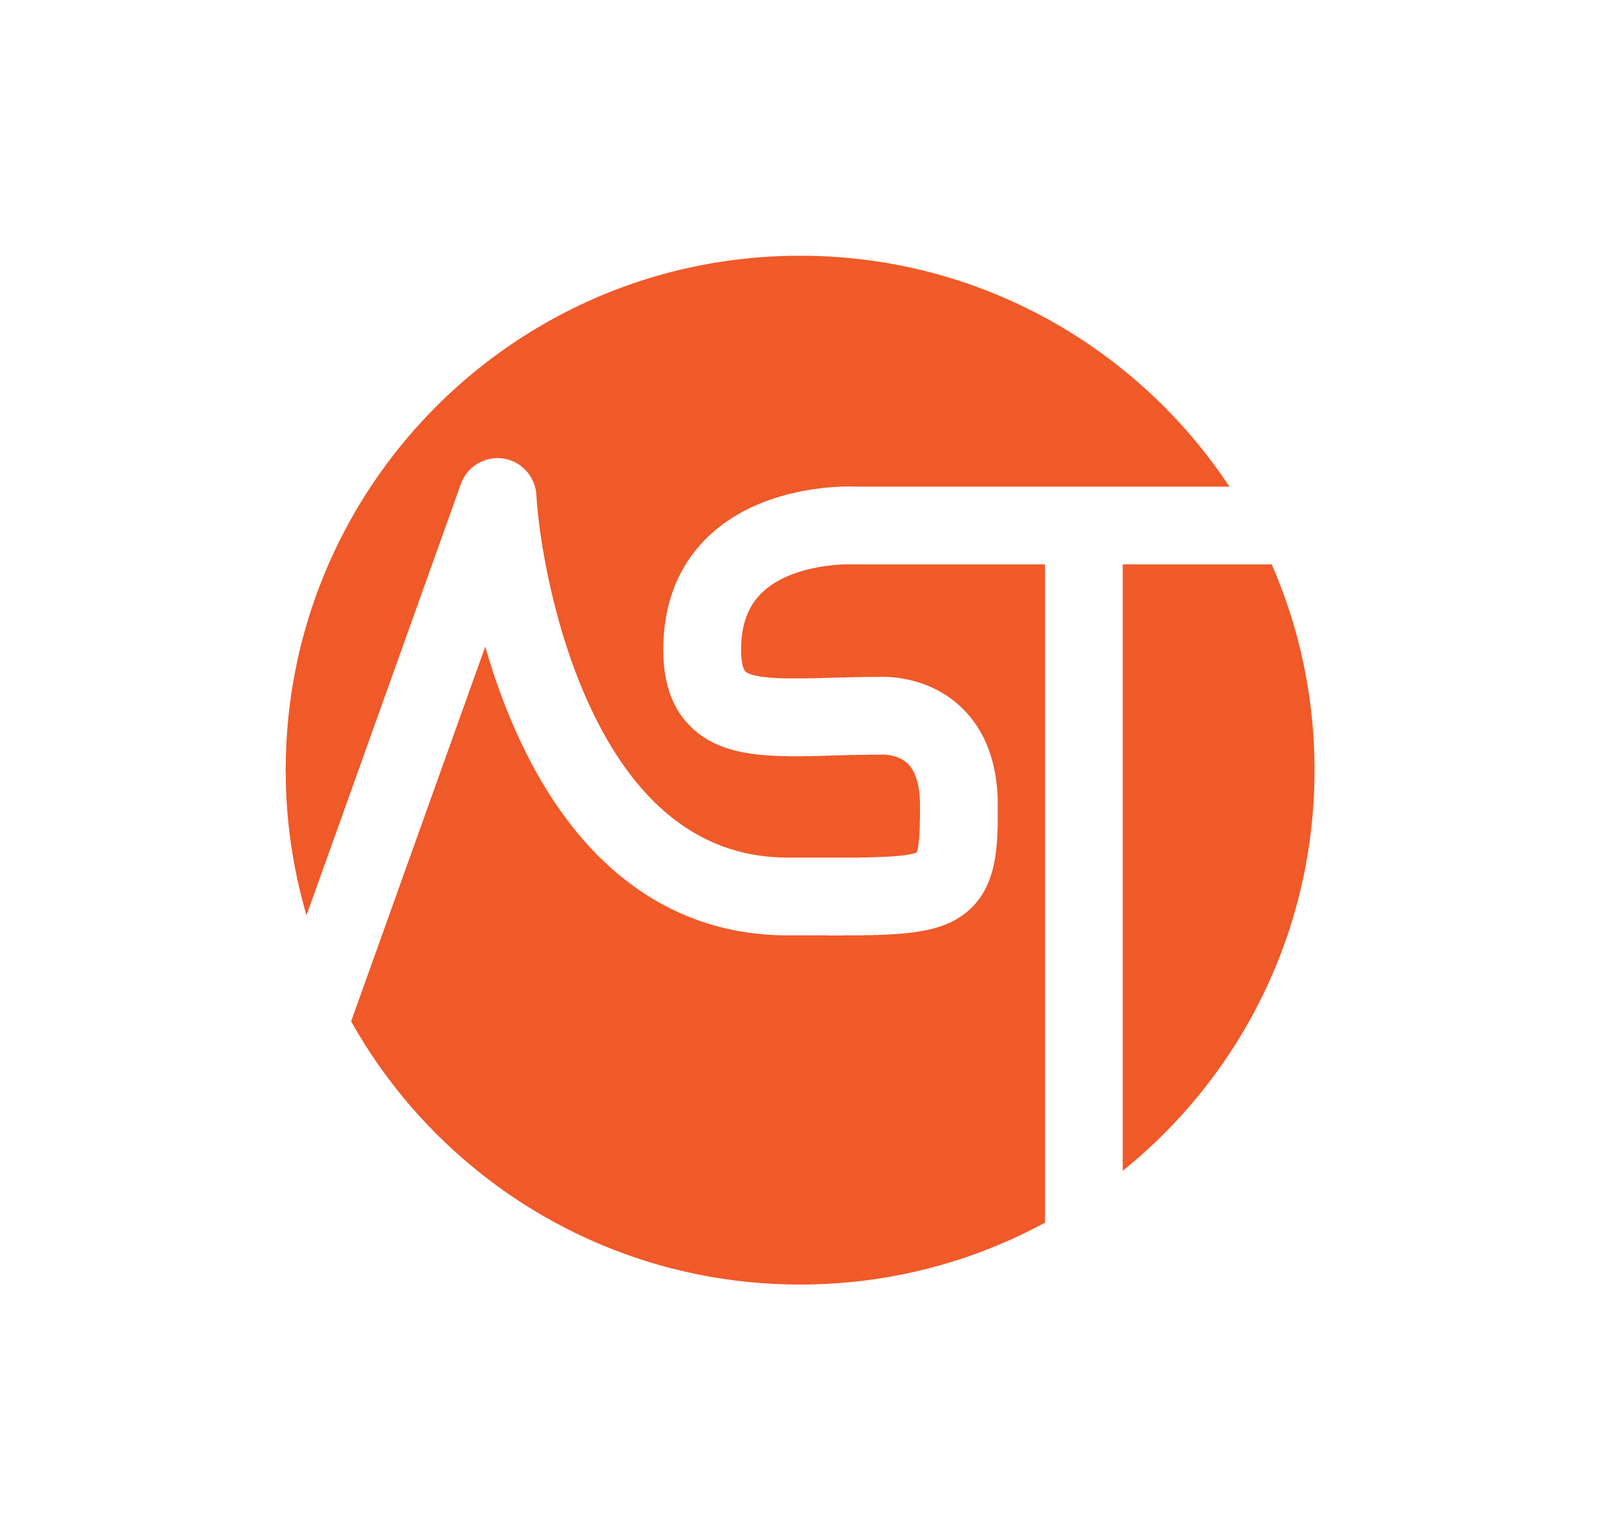 AST-01